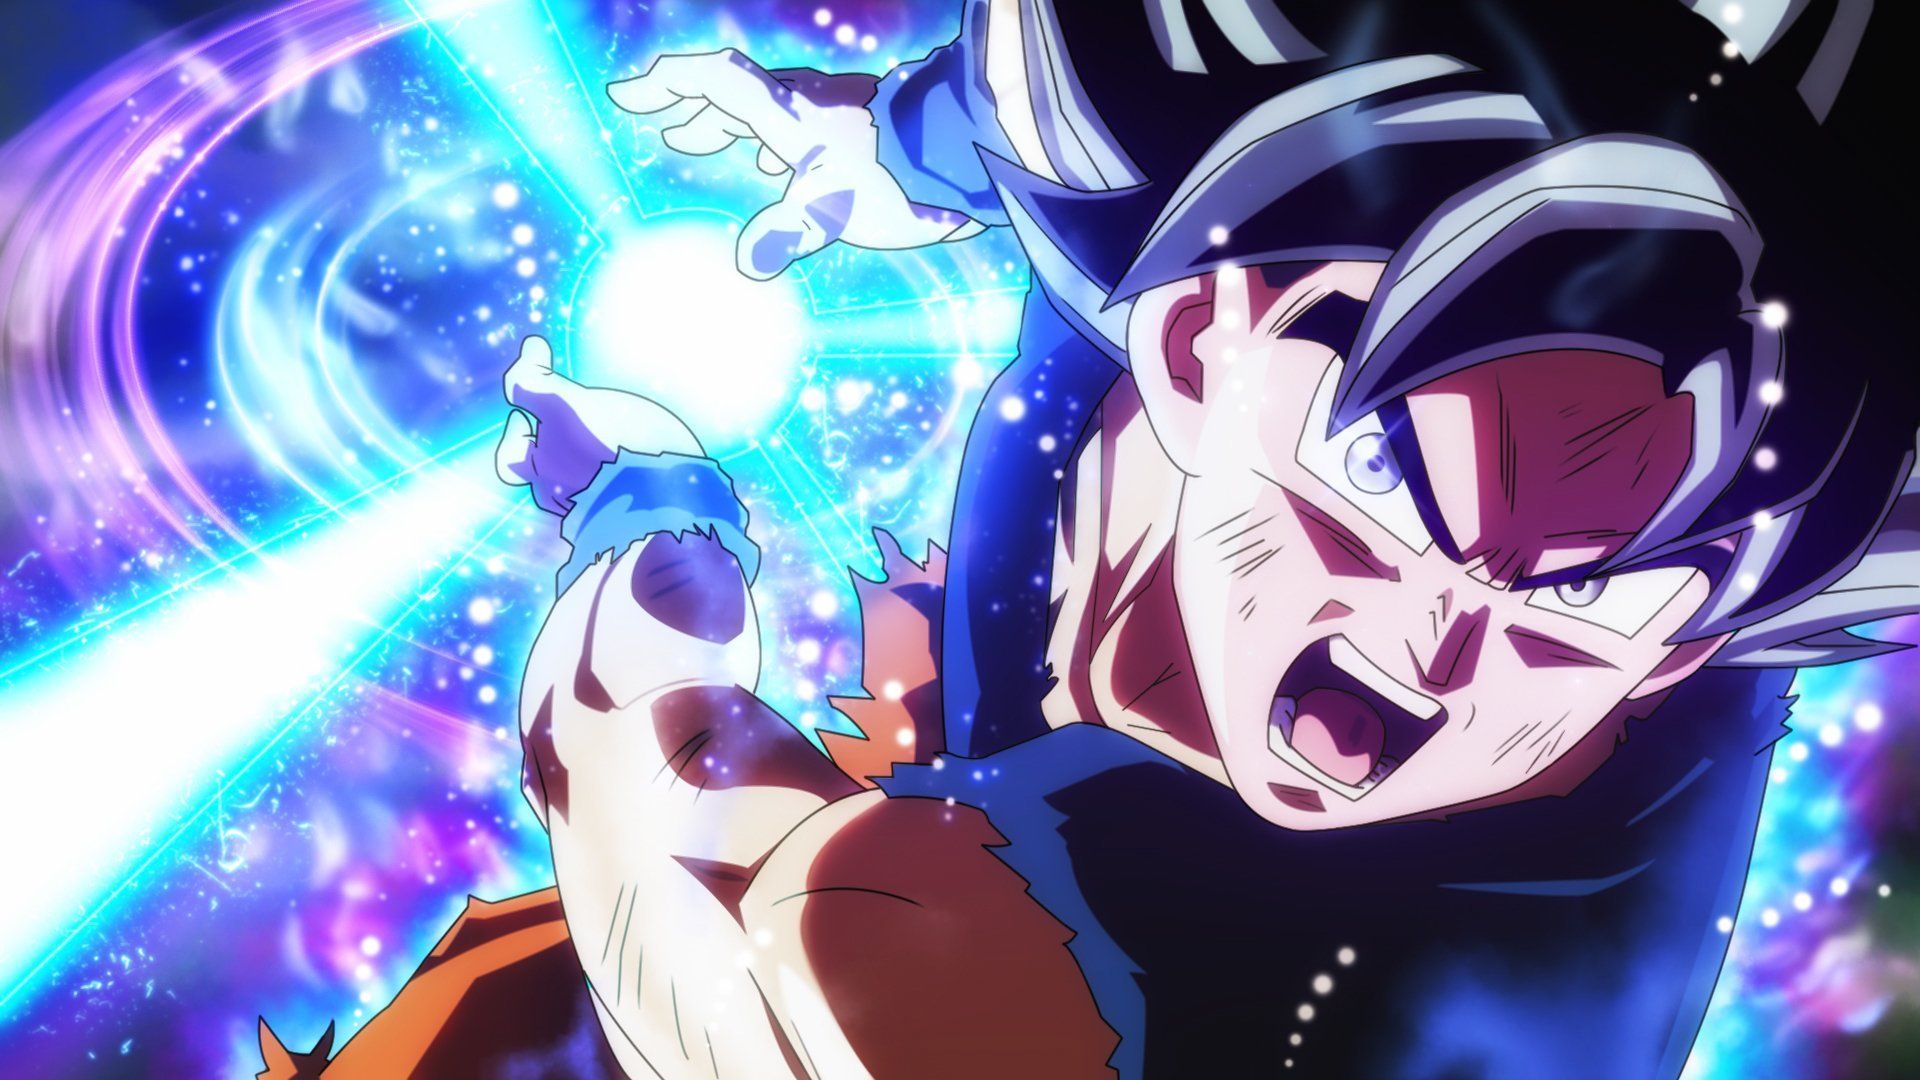 Goku Ultra Instinct Wallpapers Top Free Goku Ultra Instinct